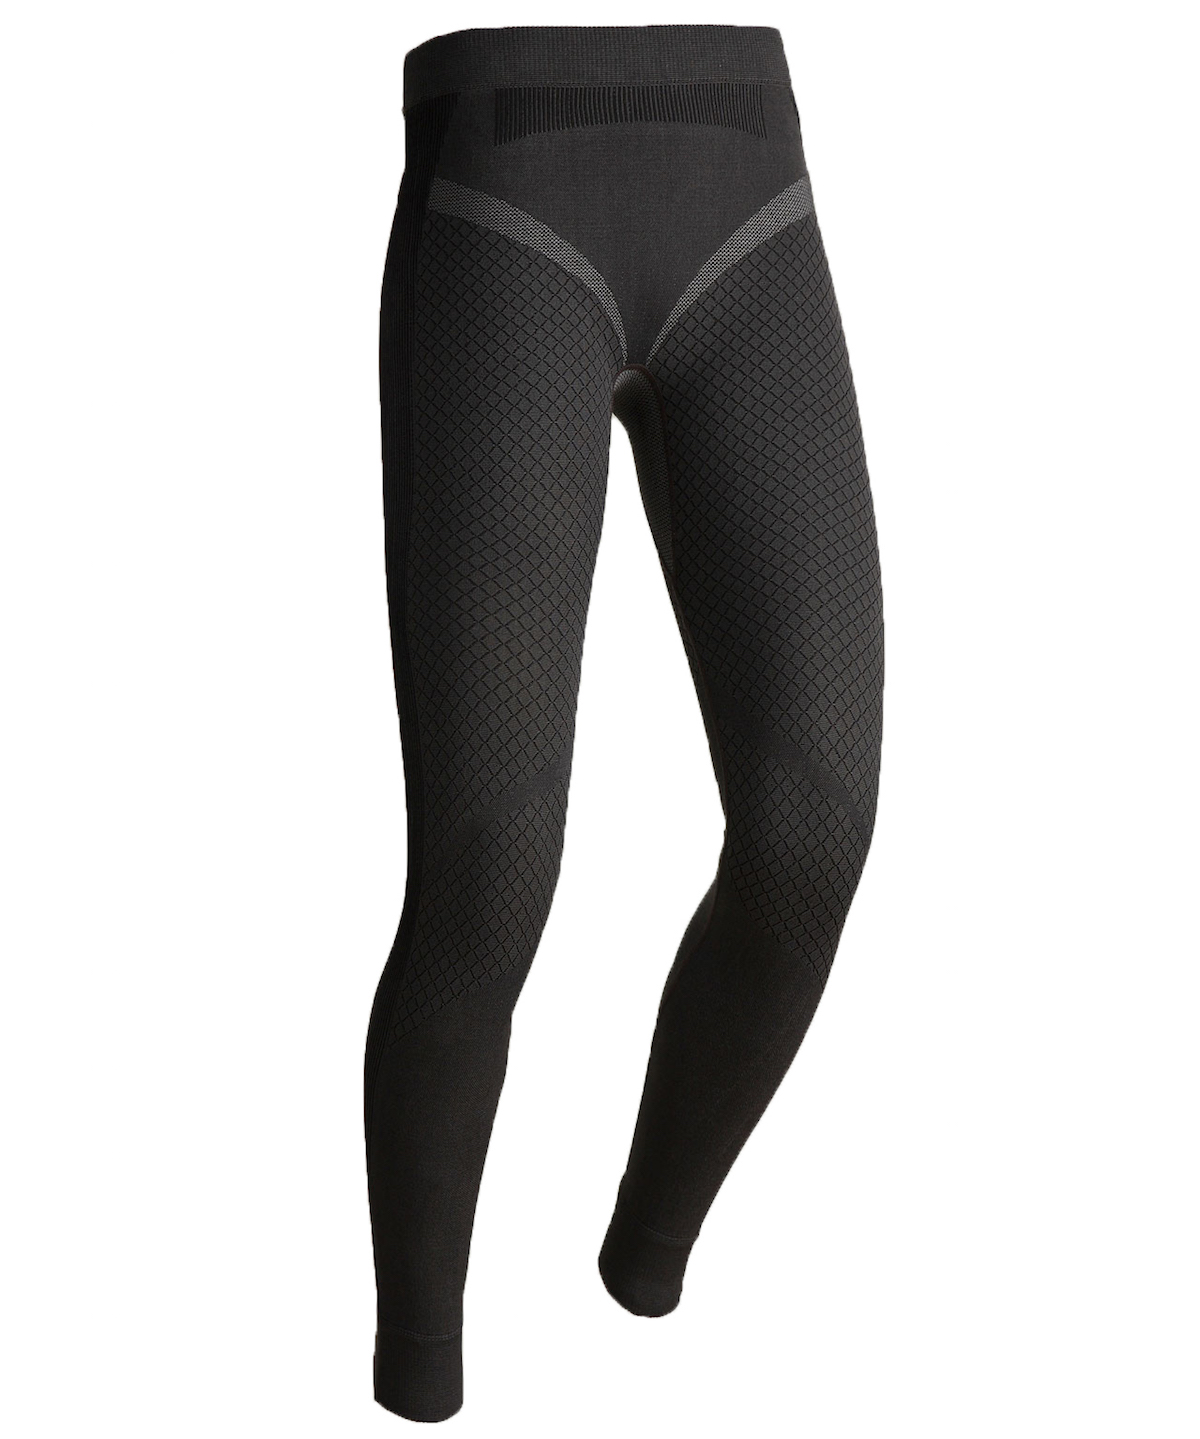 Damart Sport Activ Body 3 - Laufhose - Damen